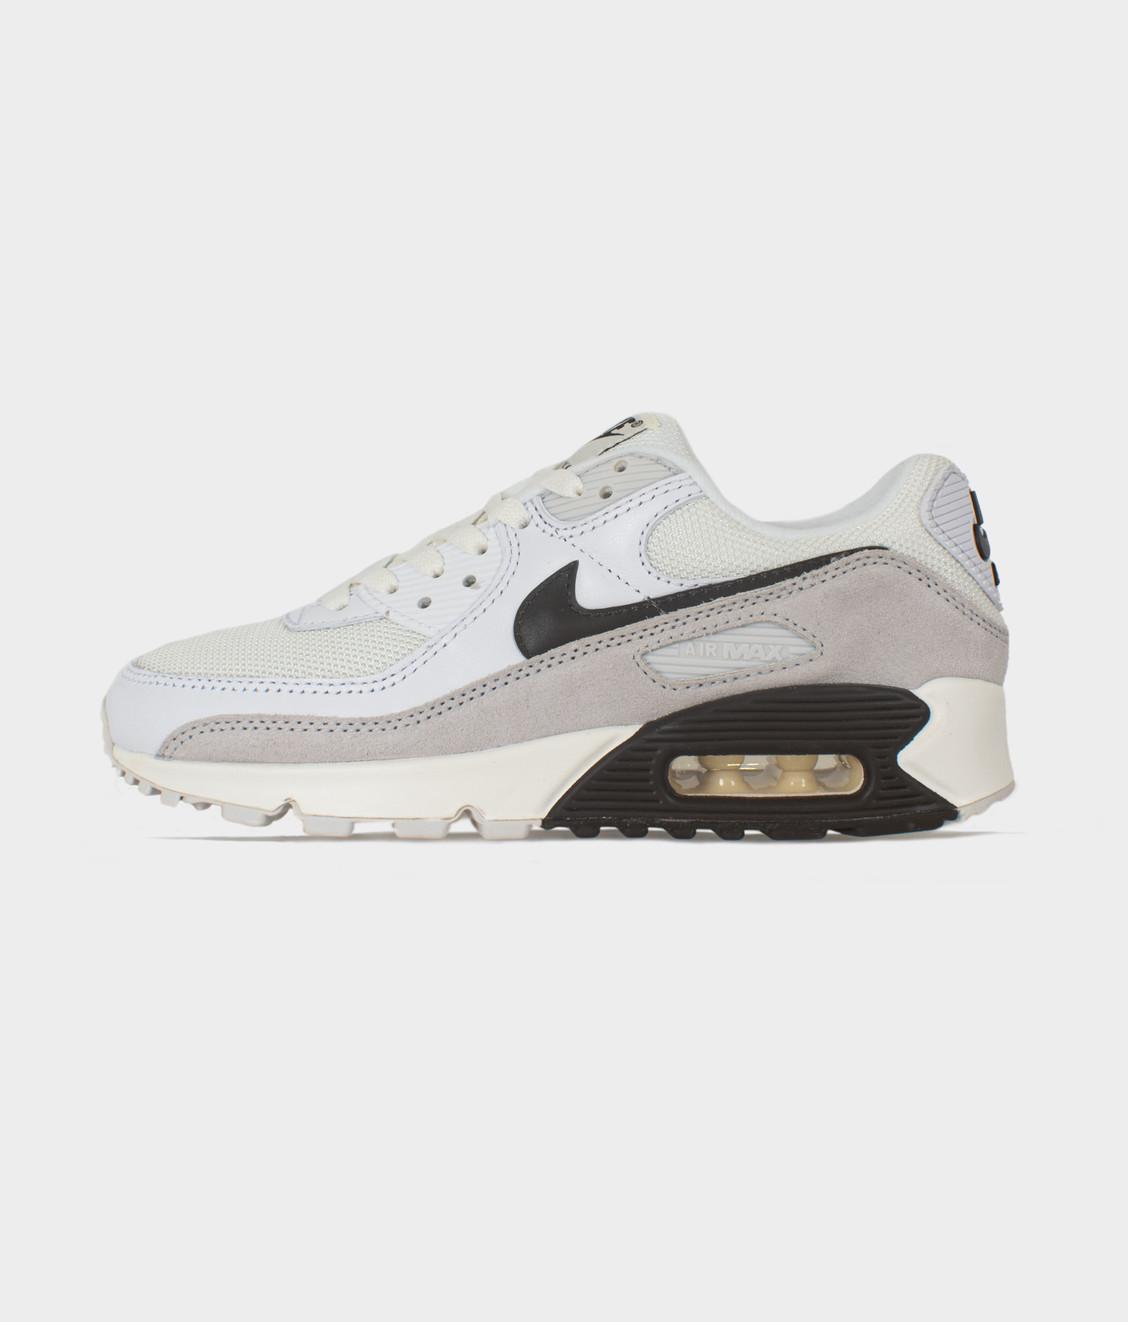 Nike Nike Air Max 90 Baroque Brown